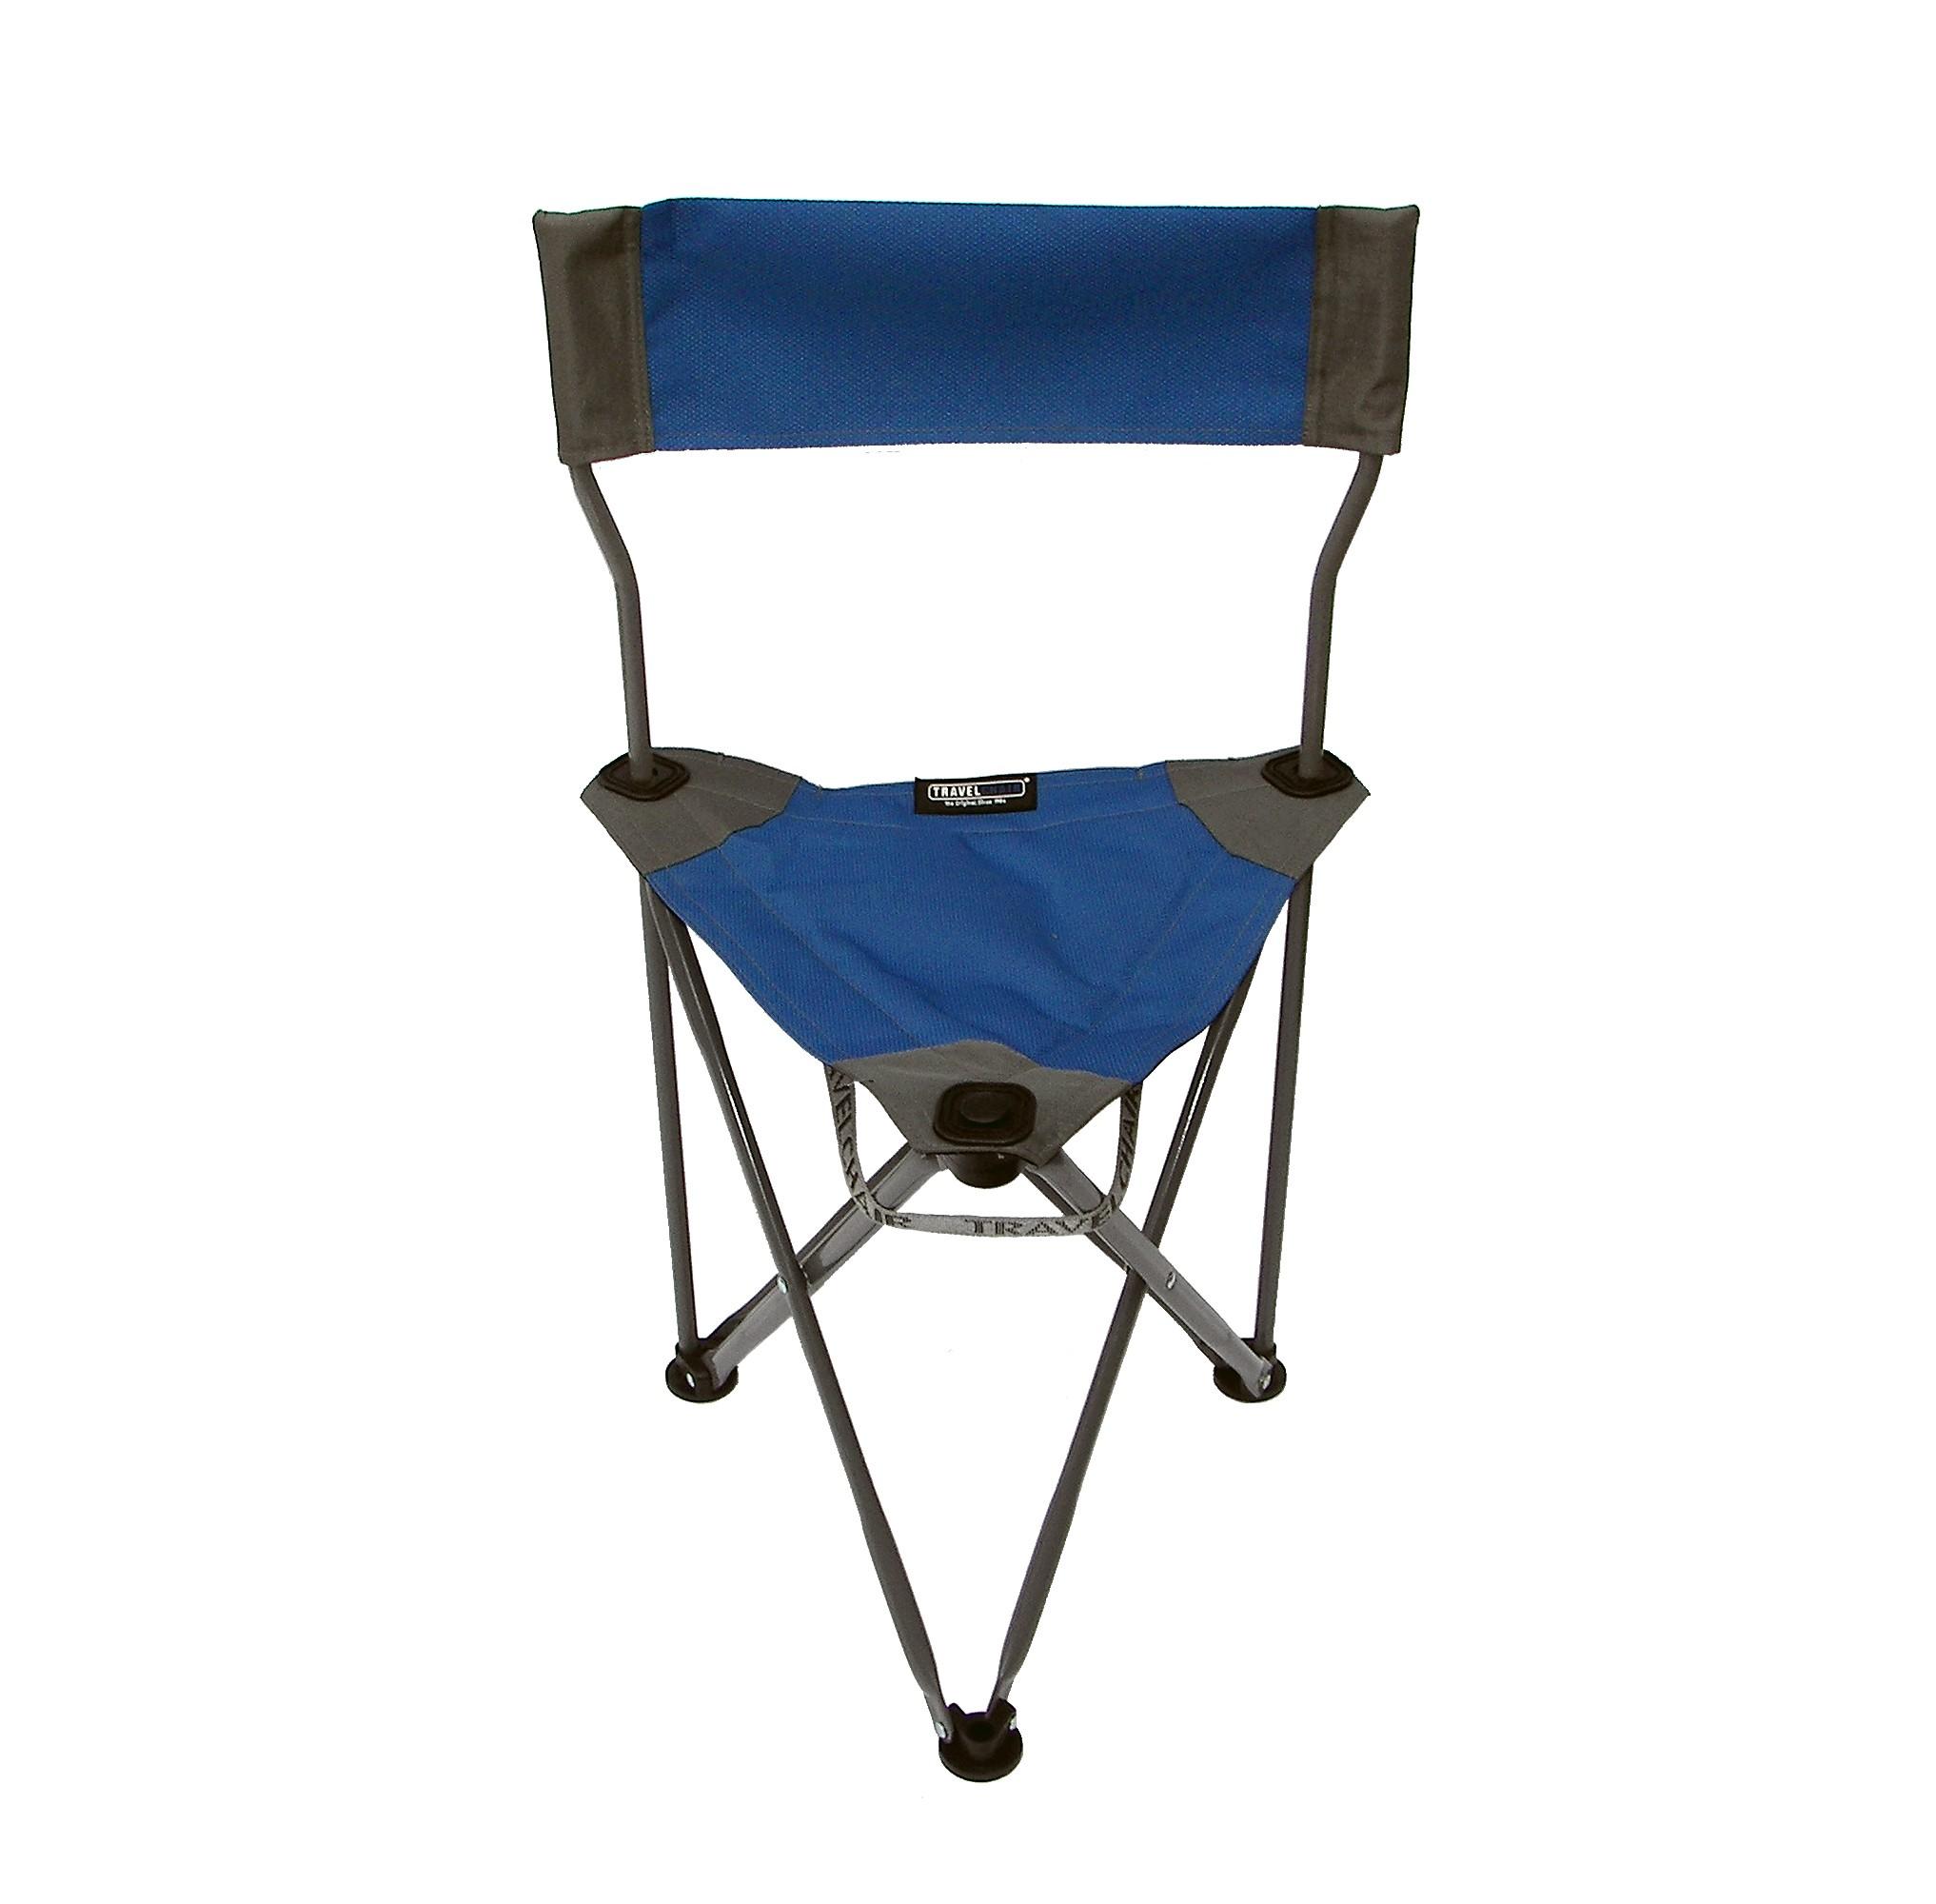 Travelchair Ultimate Slacker 2 0 1489v2 Portable Camping Stool